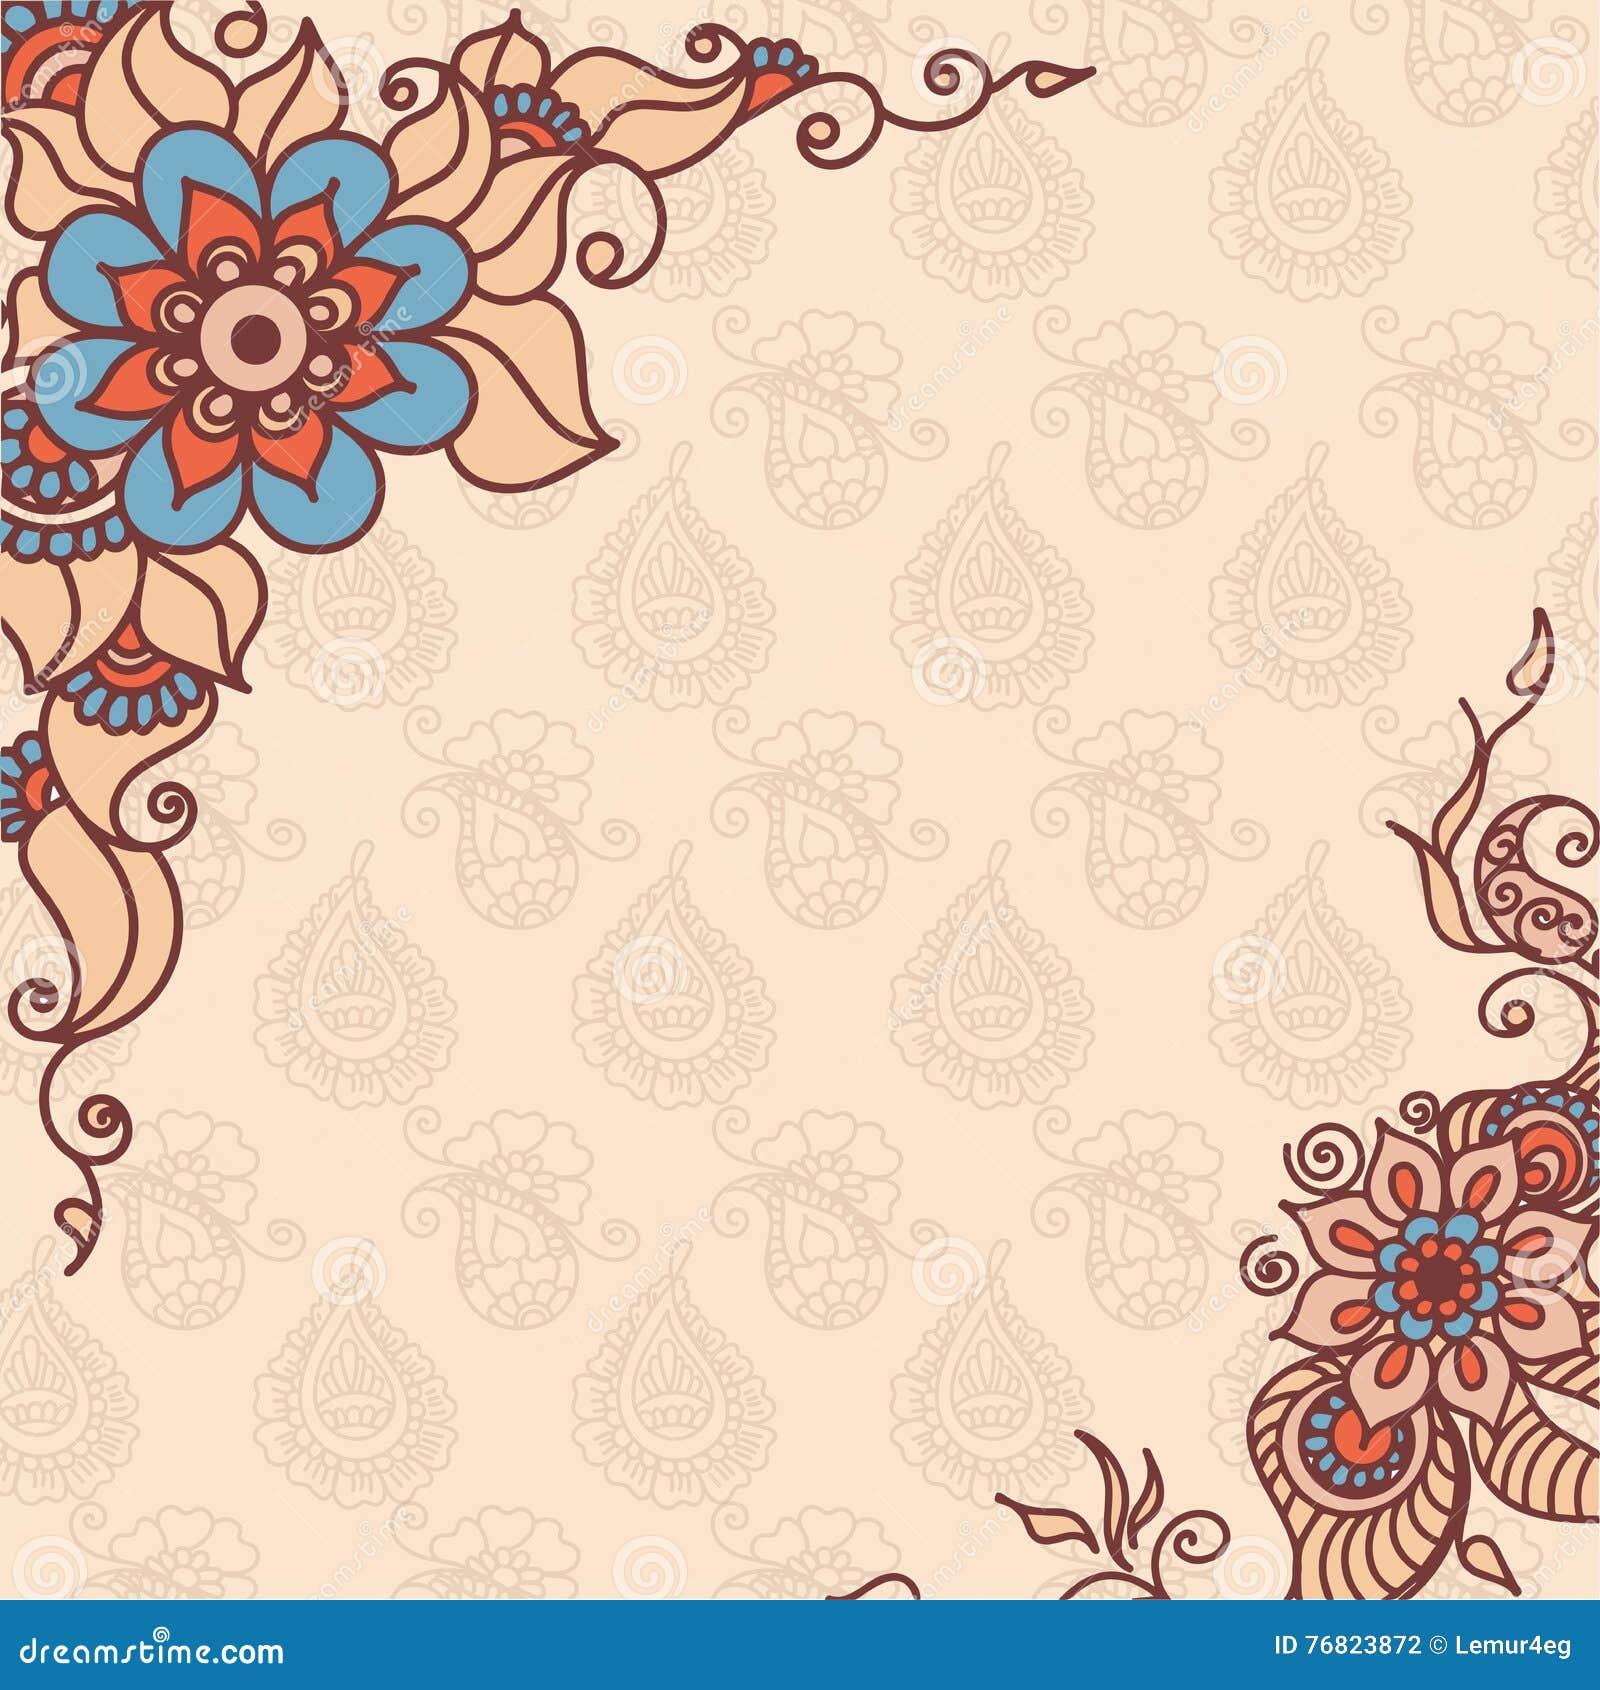 Henna Wallpaper: Abstract Vector Pattern Of A Tattoo Henna Stock Vector